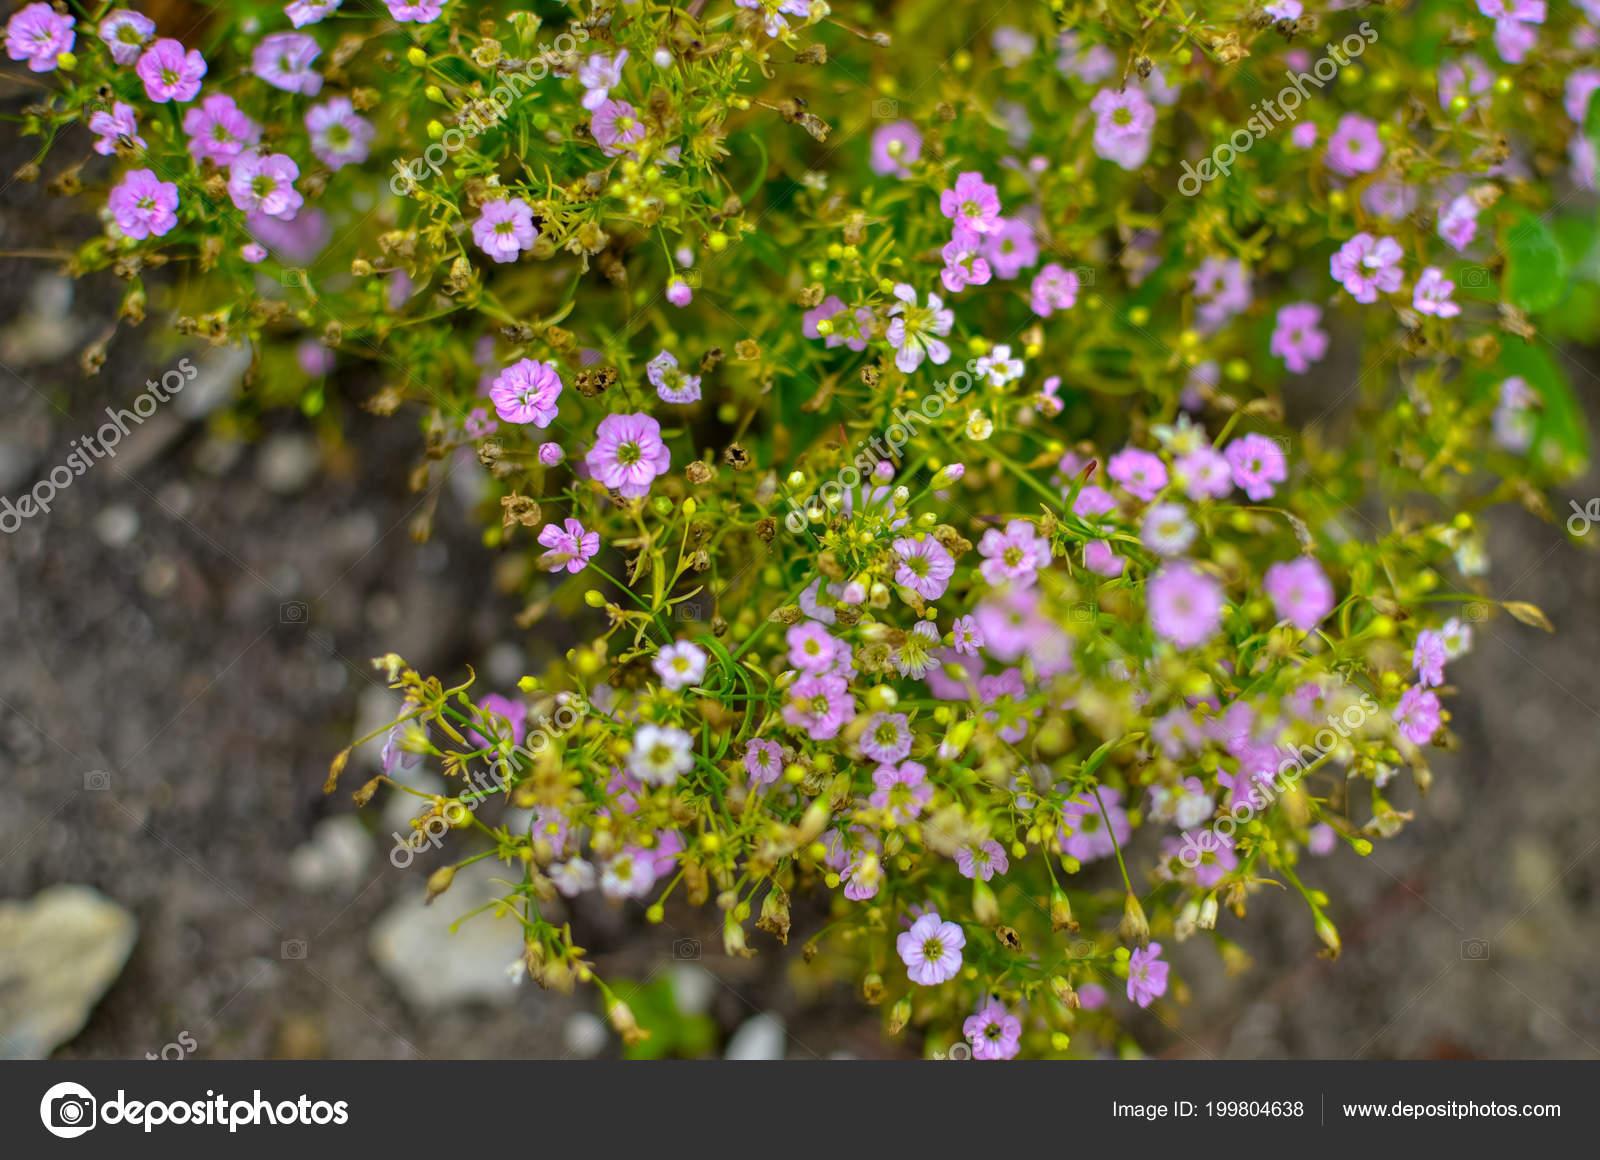 Alyssum Rose Rose Couleur Fleur Odorante Pousse Gros Buisson ...